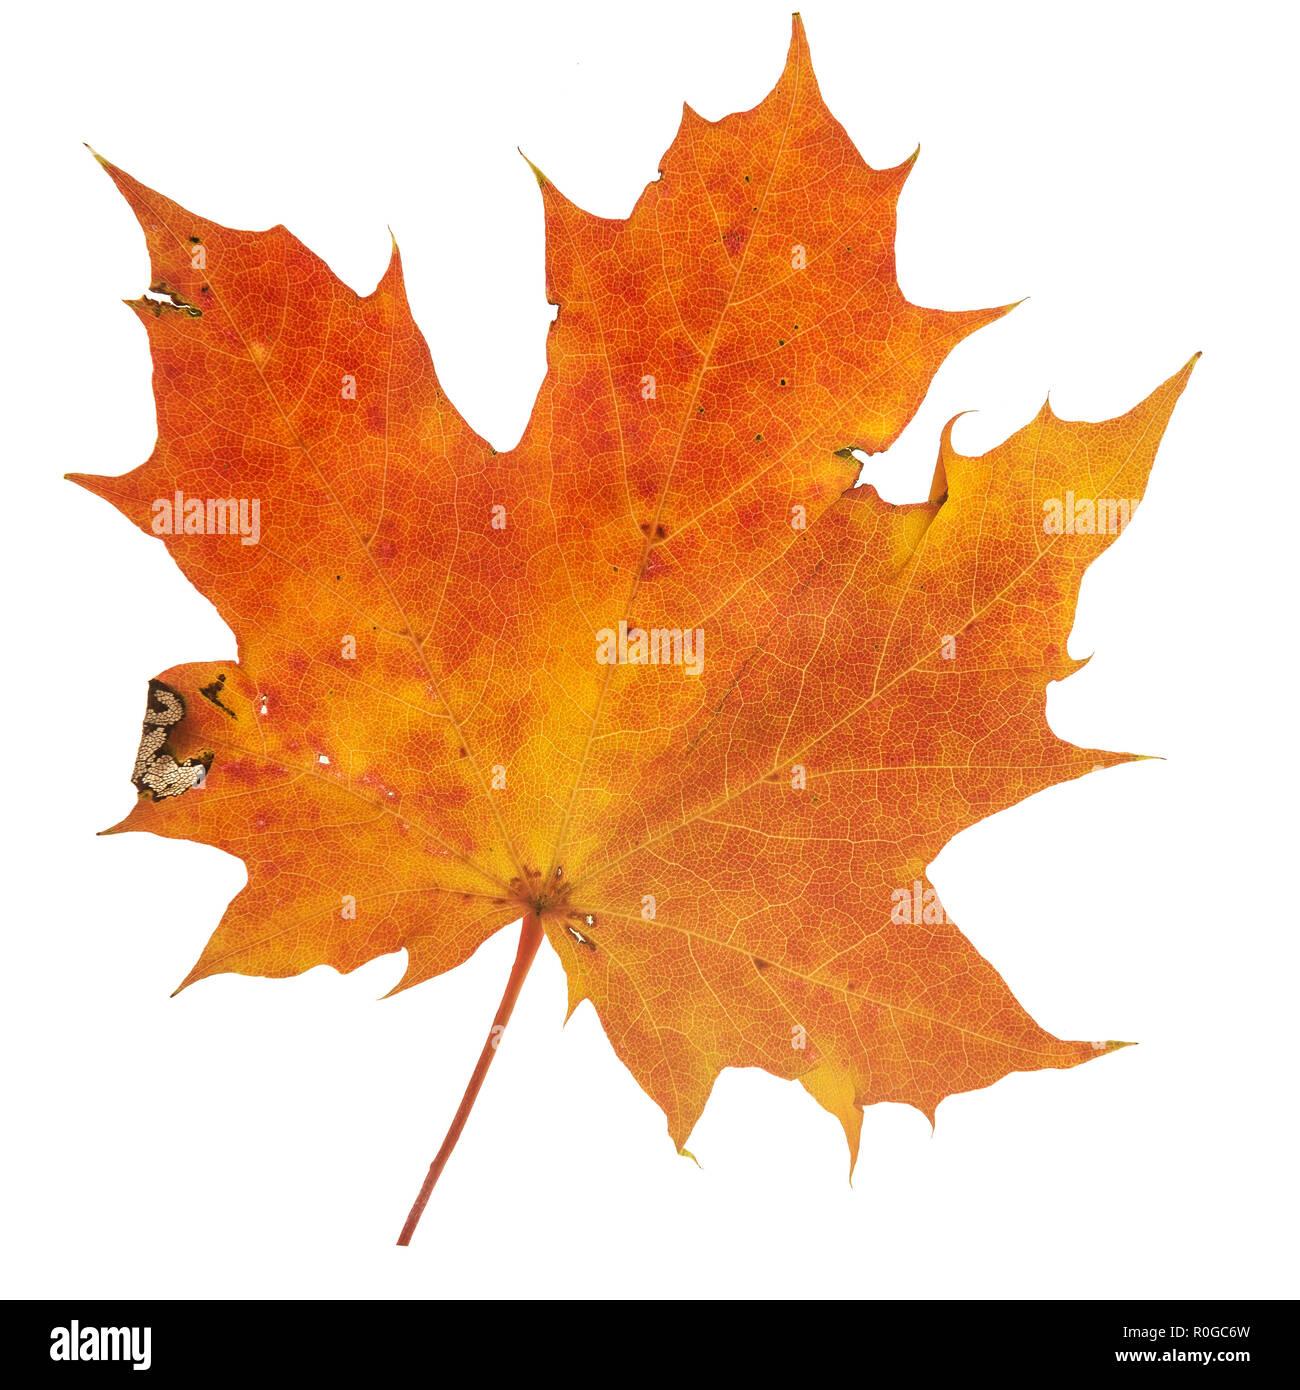 Vibrant detailed colorful autumn leaf on white background. Stock Photo